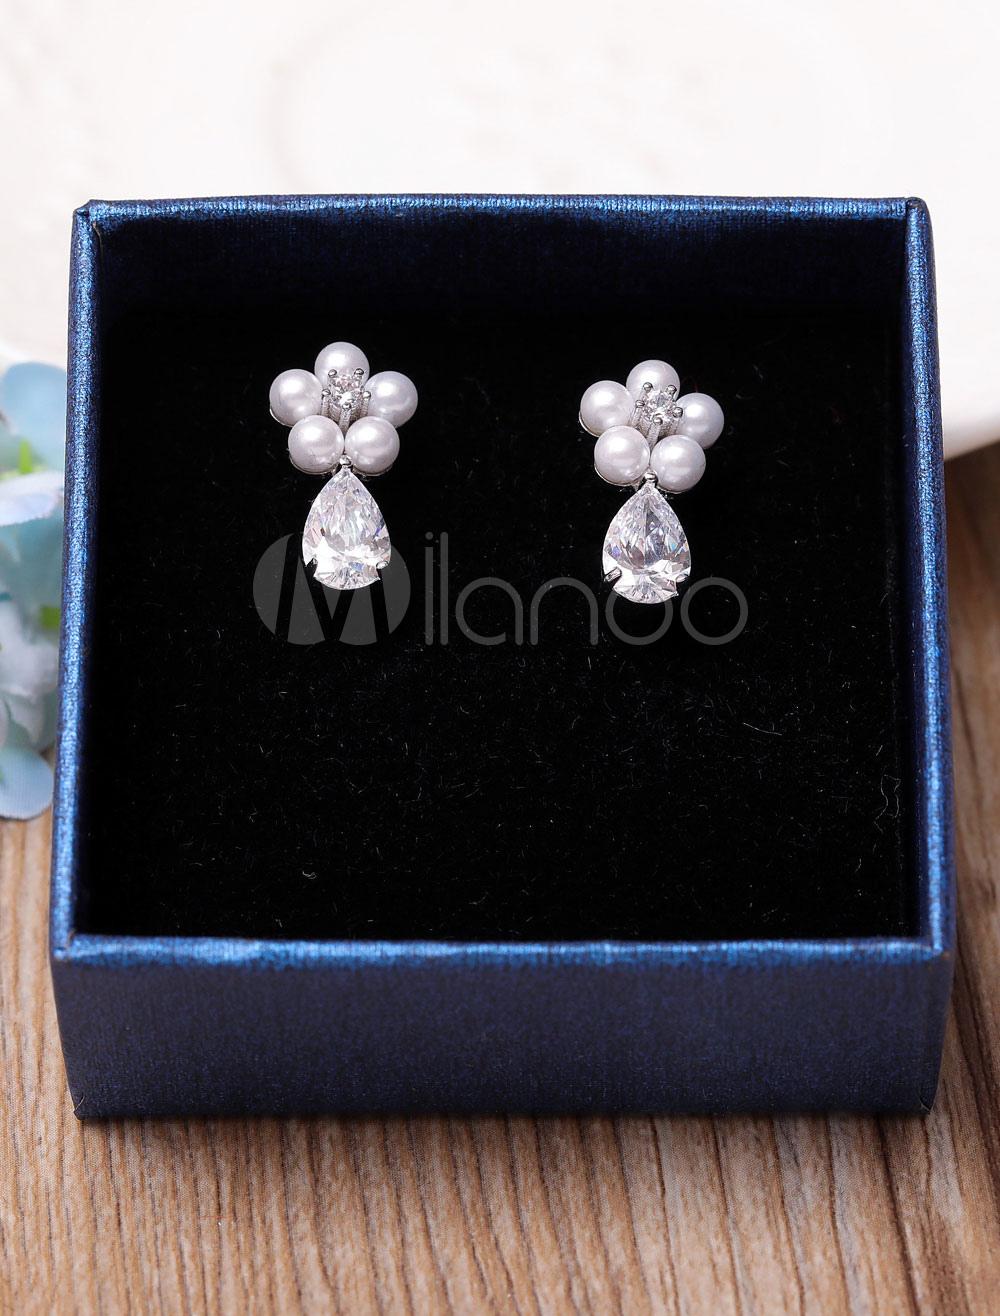 Buy Wedding Pearl Earrings Silver Cubic Zirconia Bridal Clip On Drop Earrings for $5.93 in Milanoo store